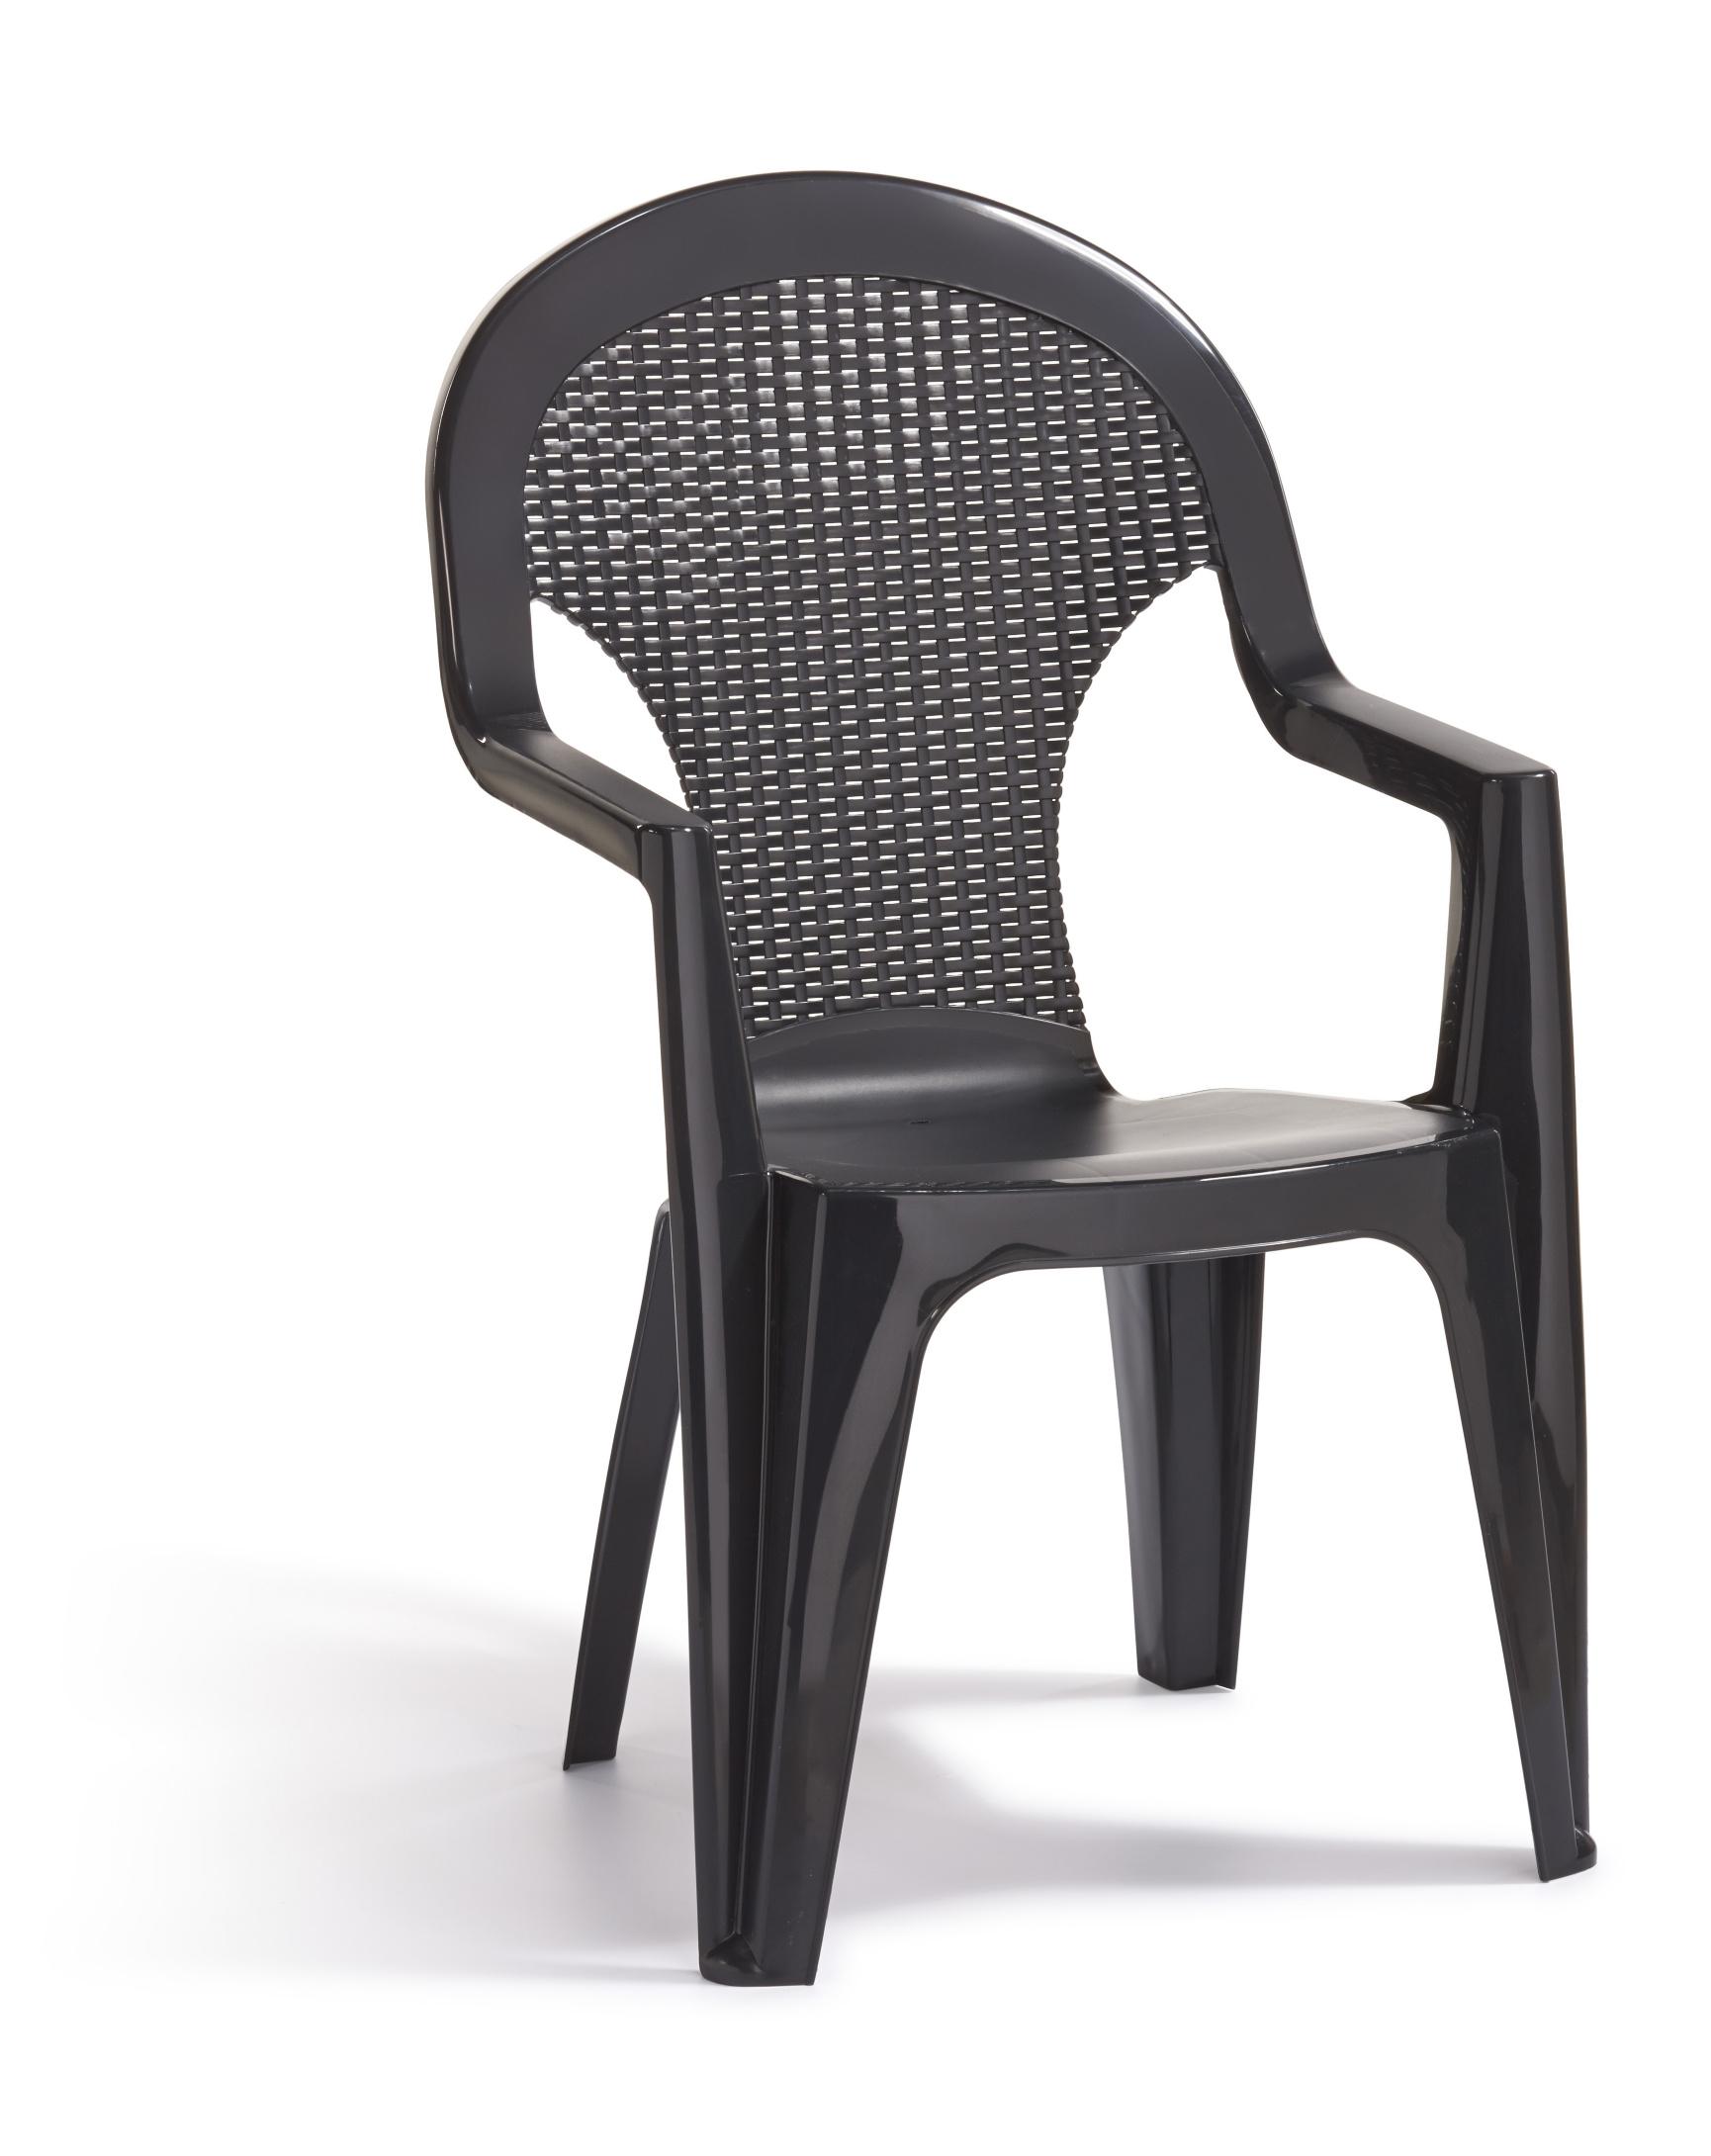 allibert santana chaise empilable graphite allibert. Black Bedroom Furniture Sets. Home Design Ideas